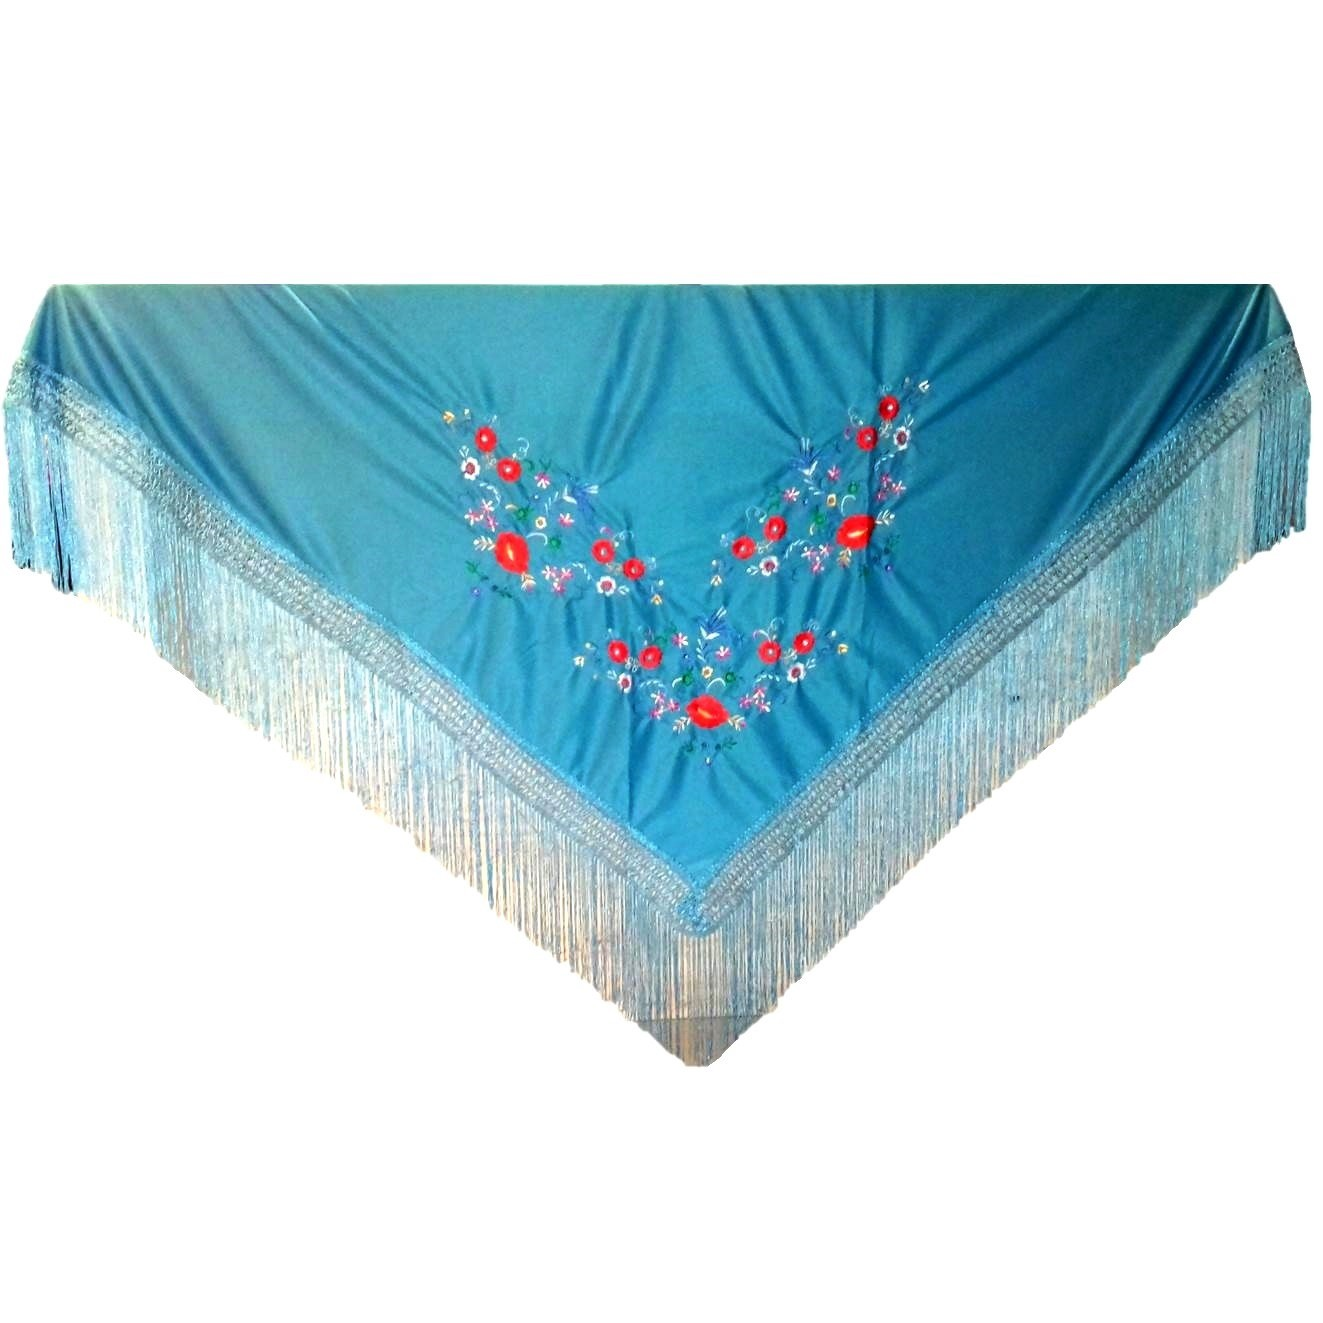 XALE ESPANHOL bordado 160x75 azul flamenco cigano